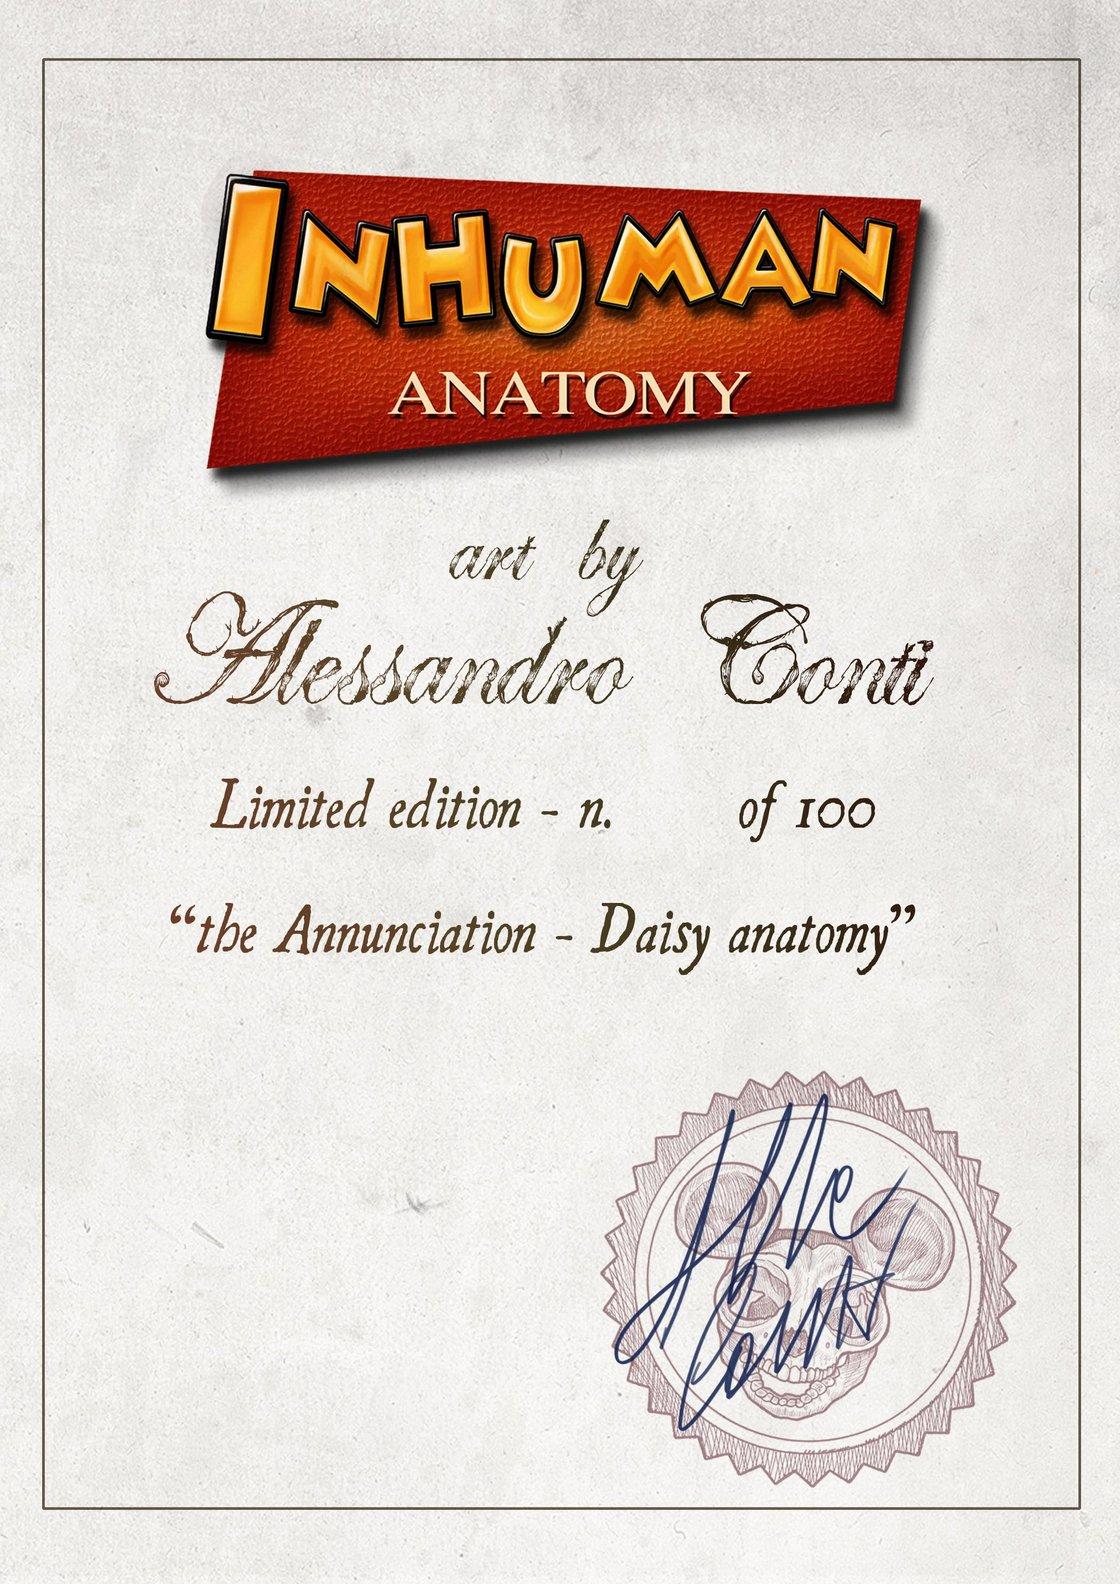 Image of INHUMAN ANATOMY - Daisy's anatomy - limited edition of 100 - Giclèe print on fine art canvas